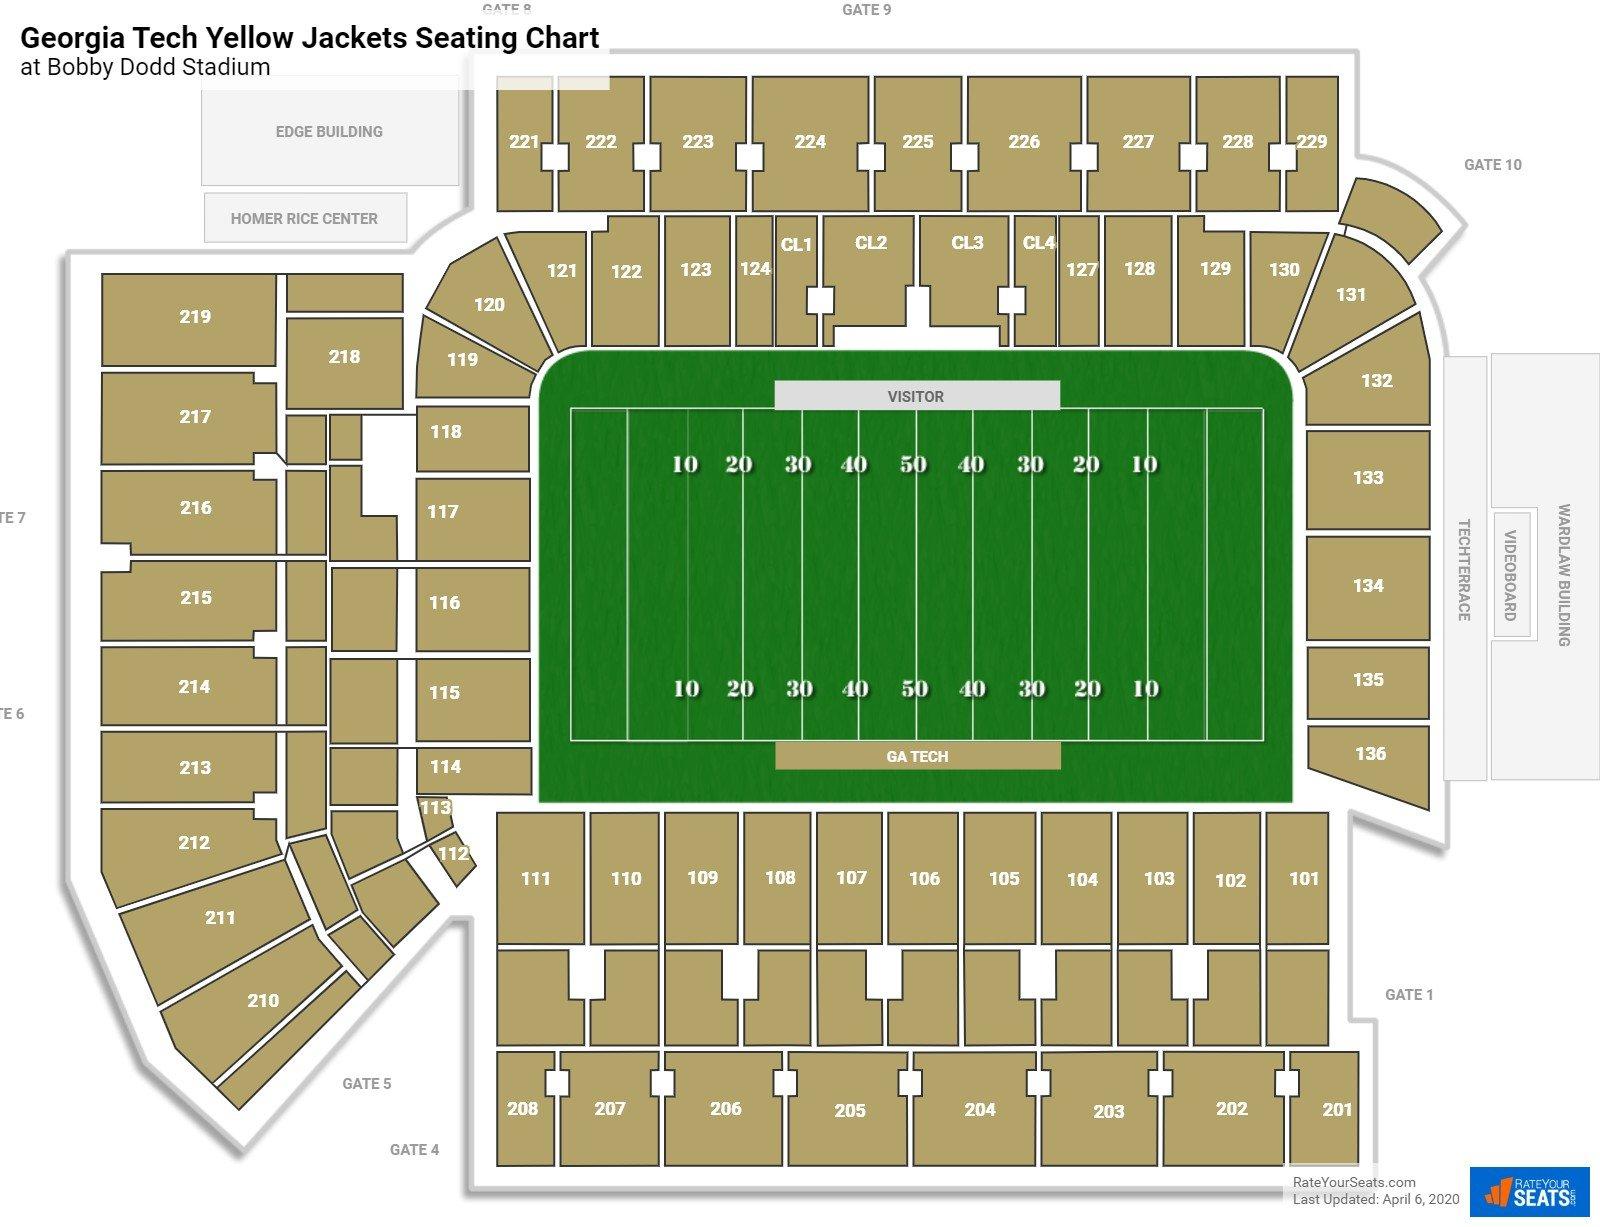 Bobby Dodd Stadium Seating Charts Rateyourseats Com